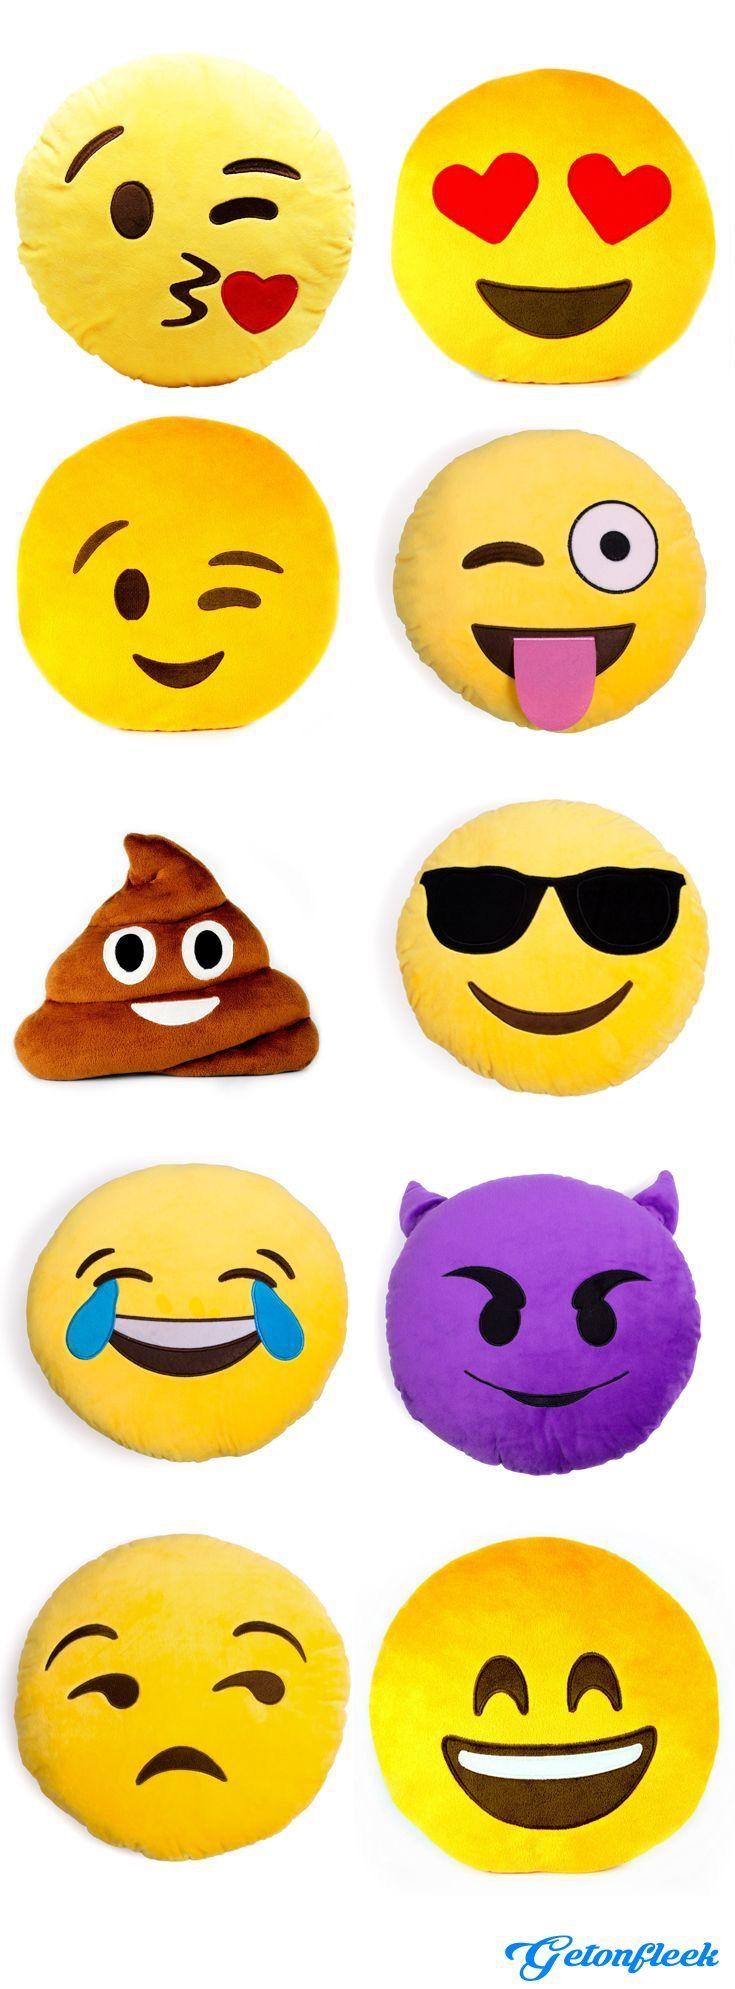 Pin by Hello😘😋😍😝😂 on Emoji things u can buy Emoji